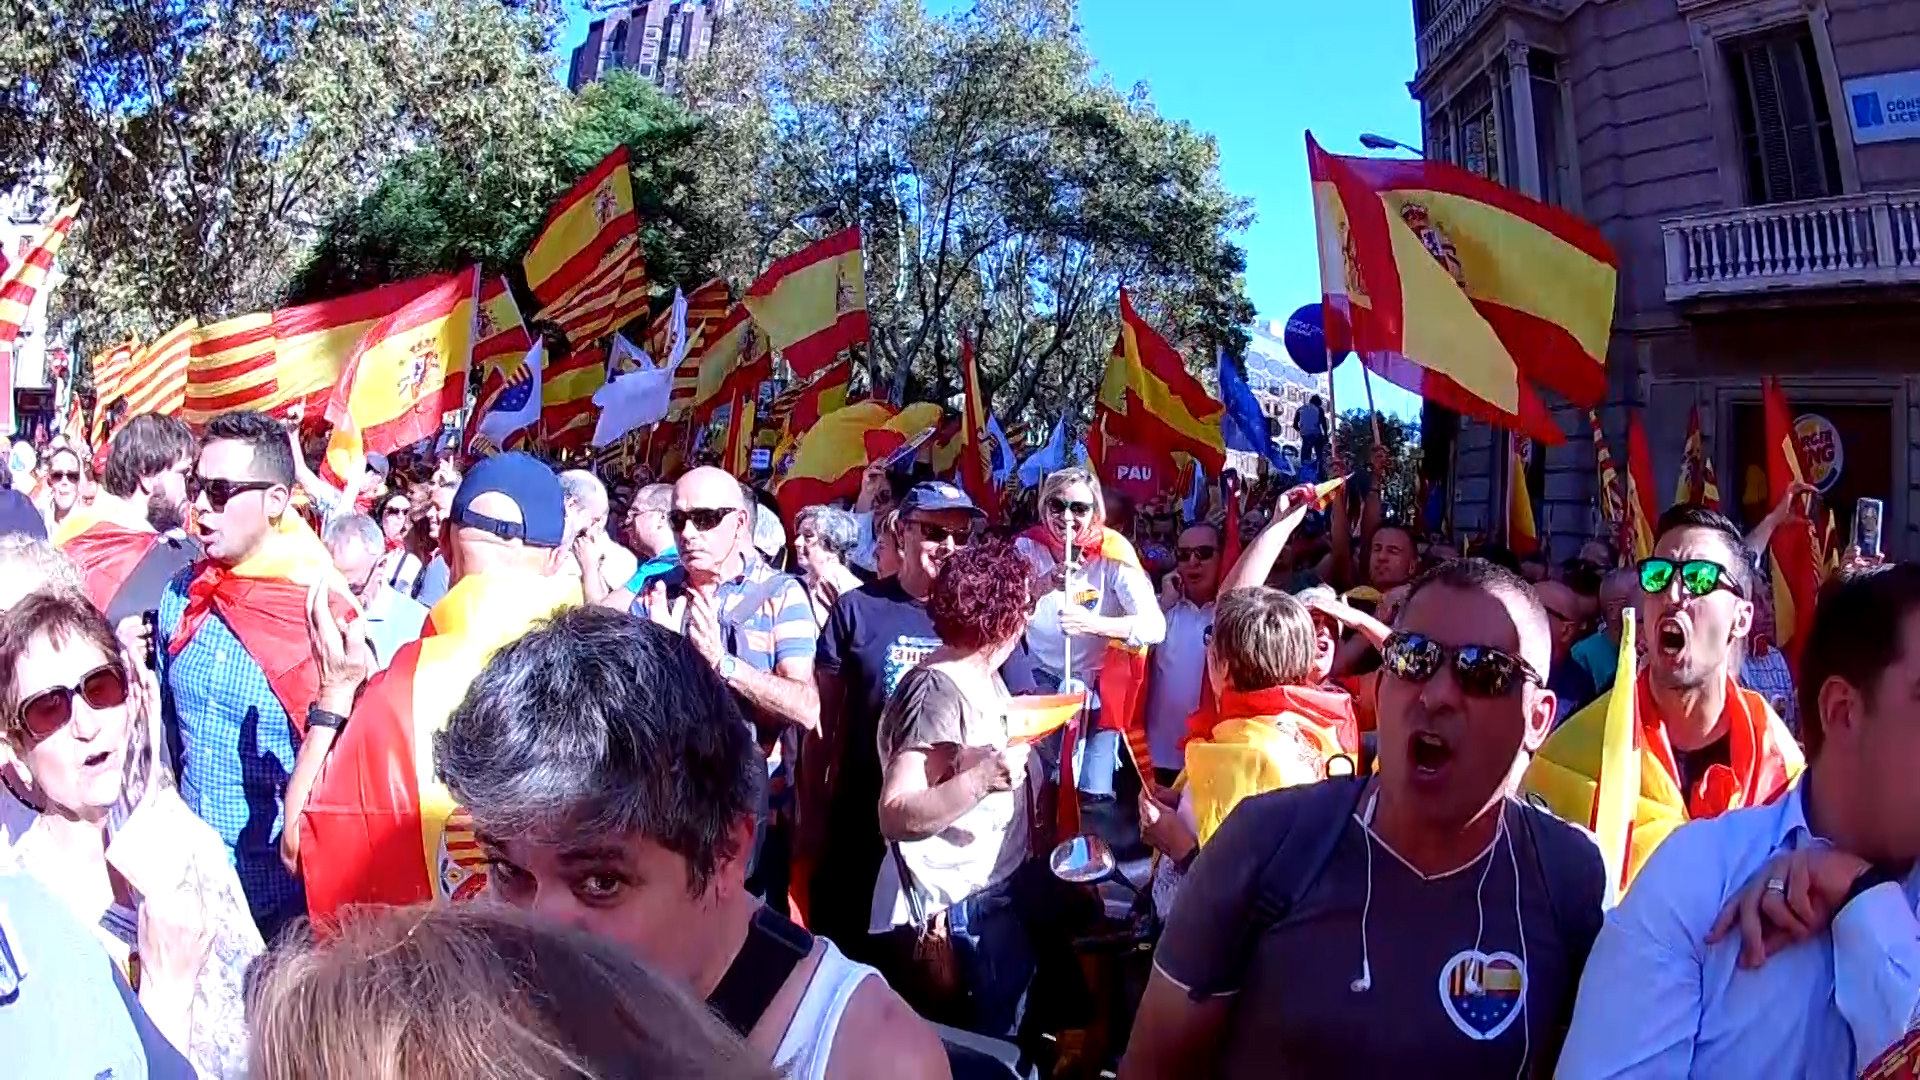 demo_barcelona02.jpg